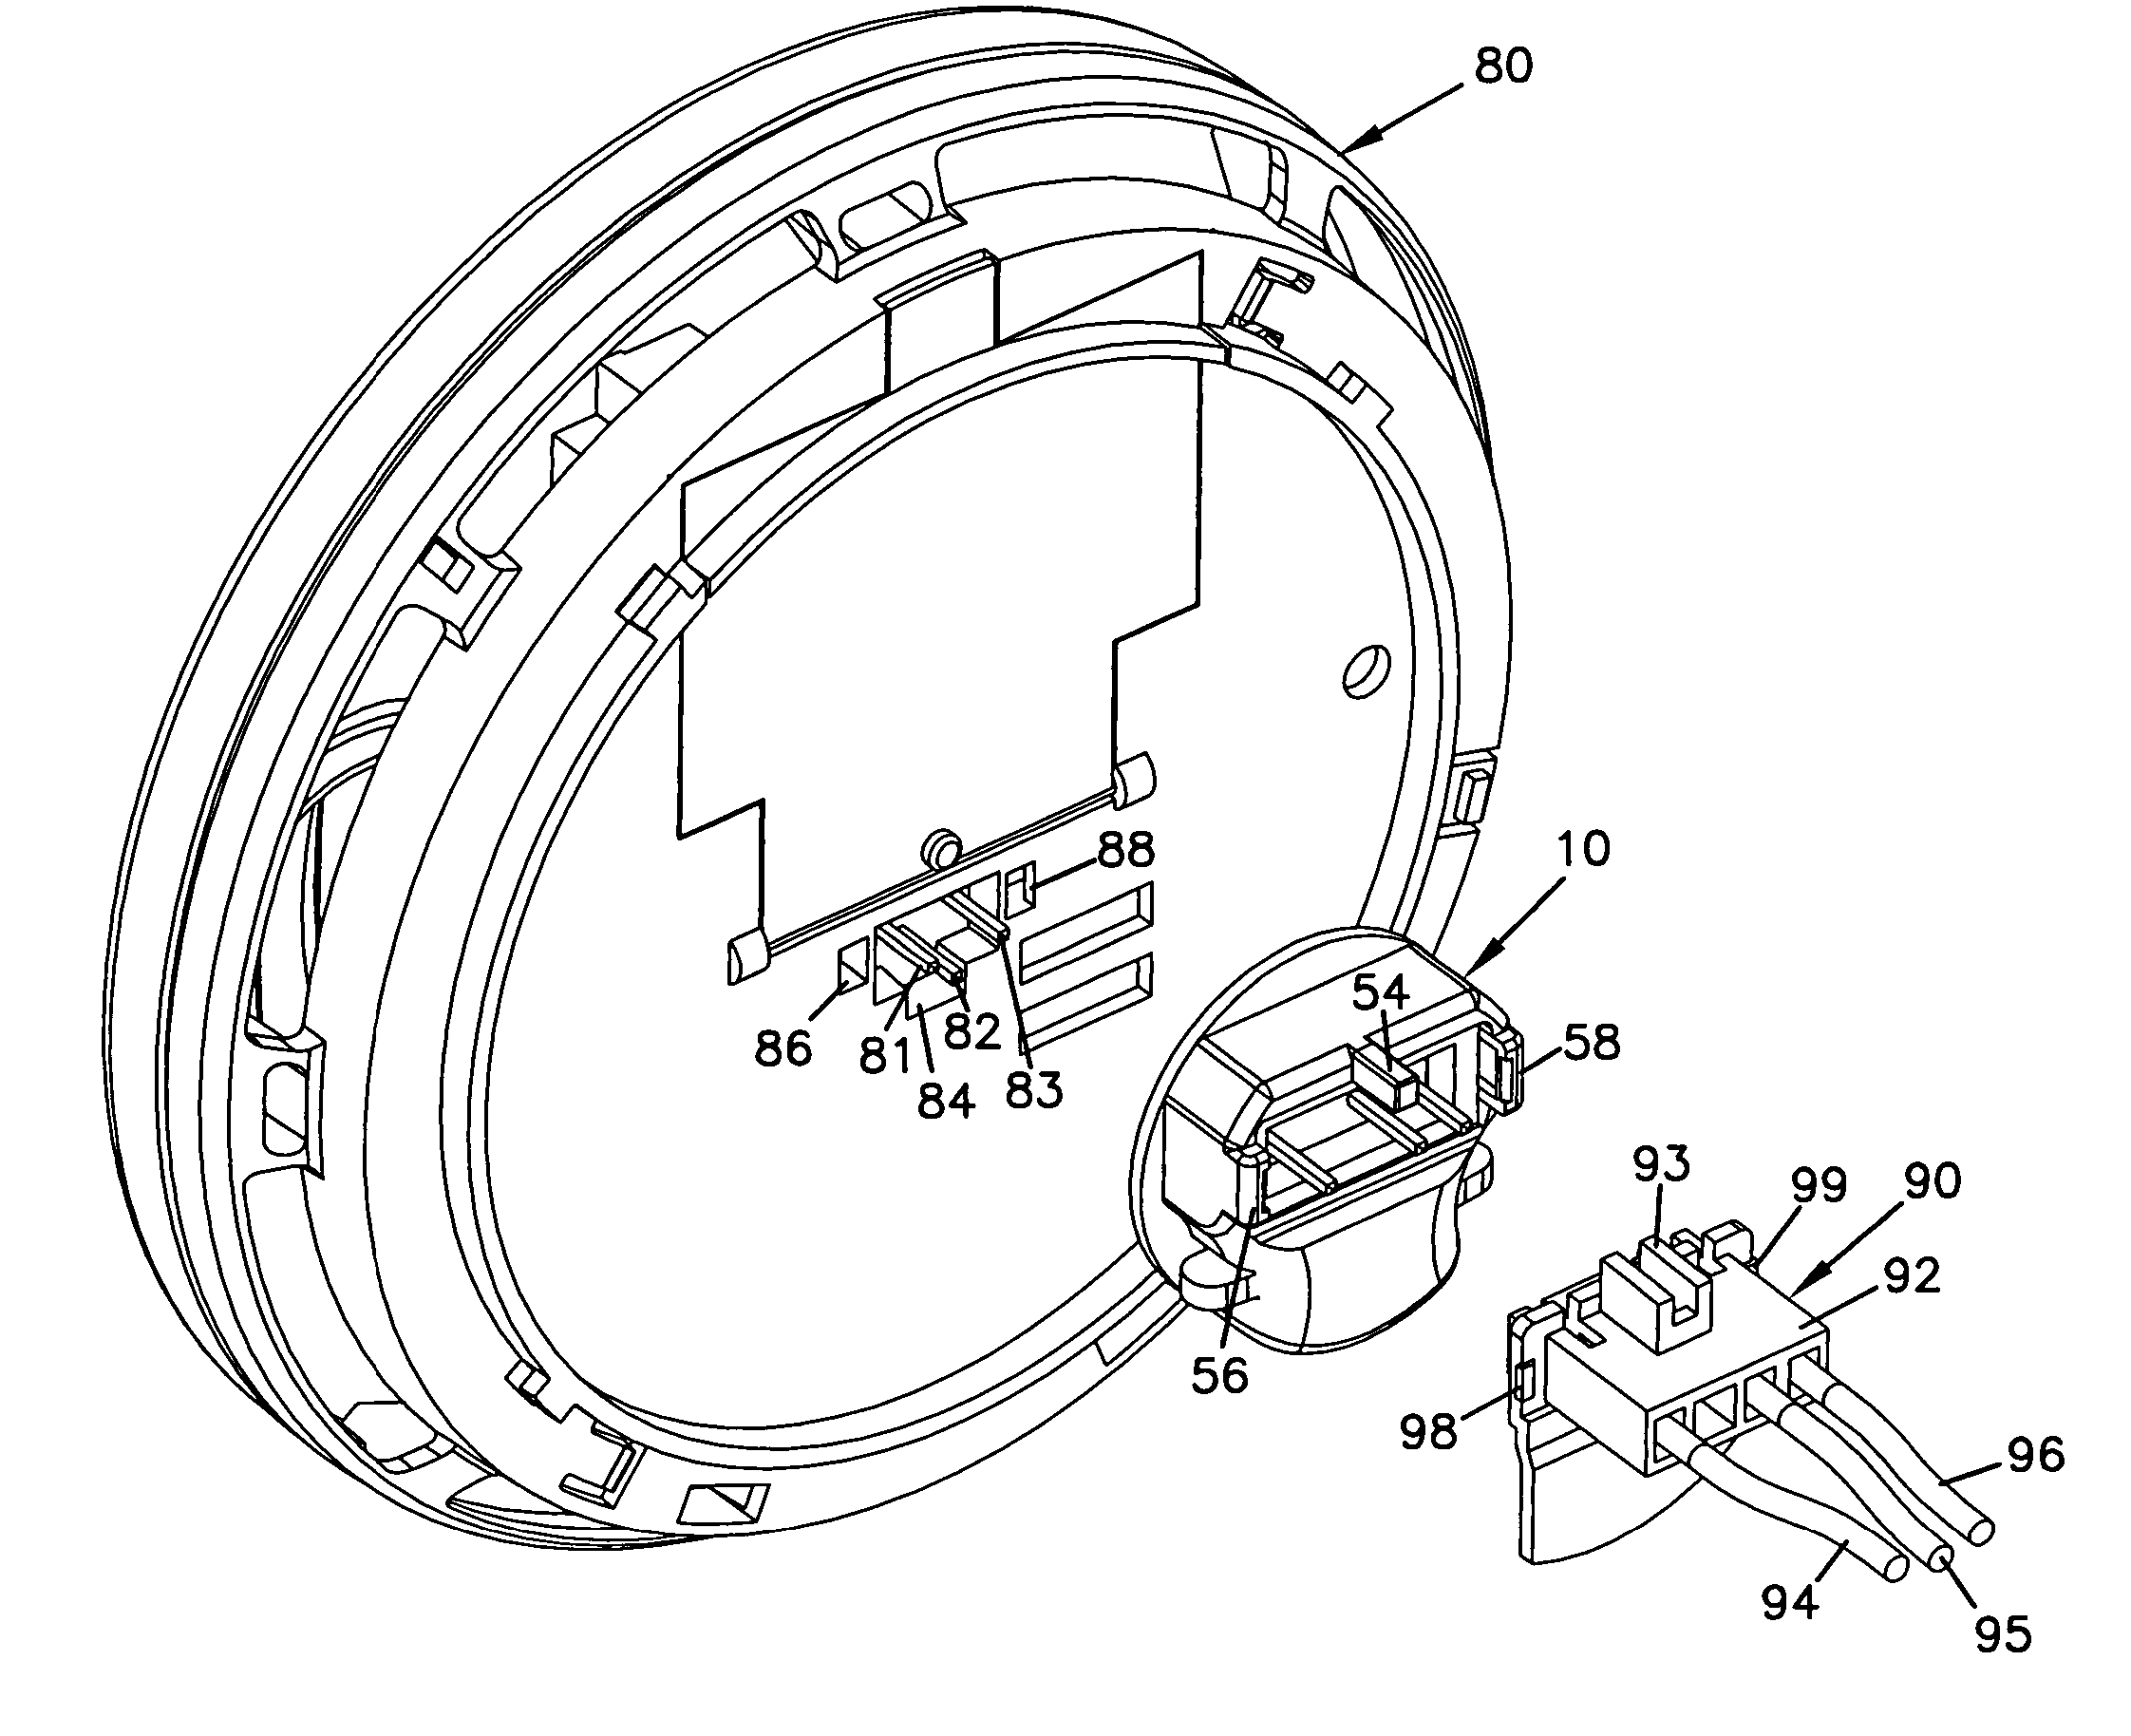 patent us6976883 - adaptor apparatus and method for interchanging smoke alarms